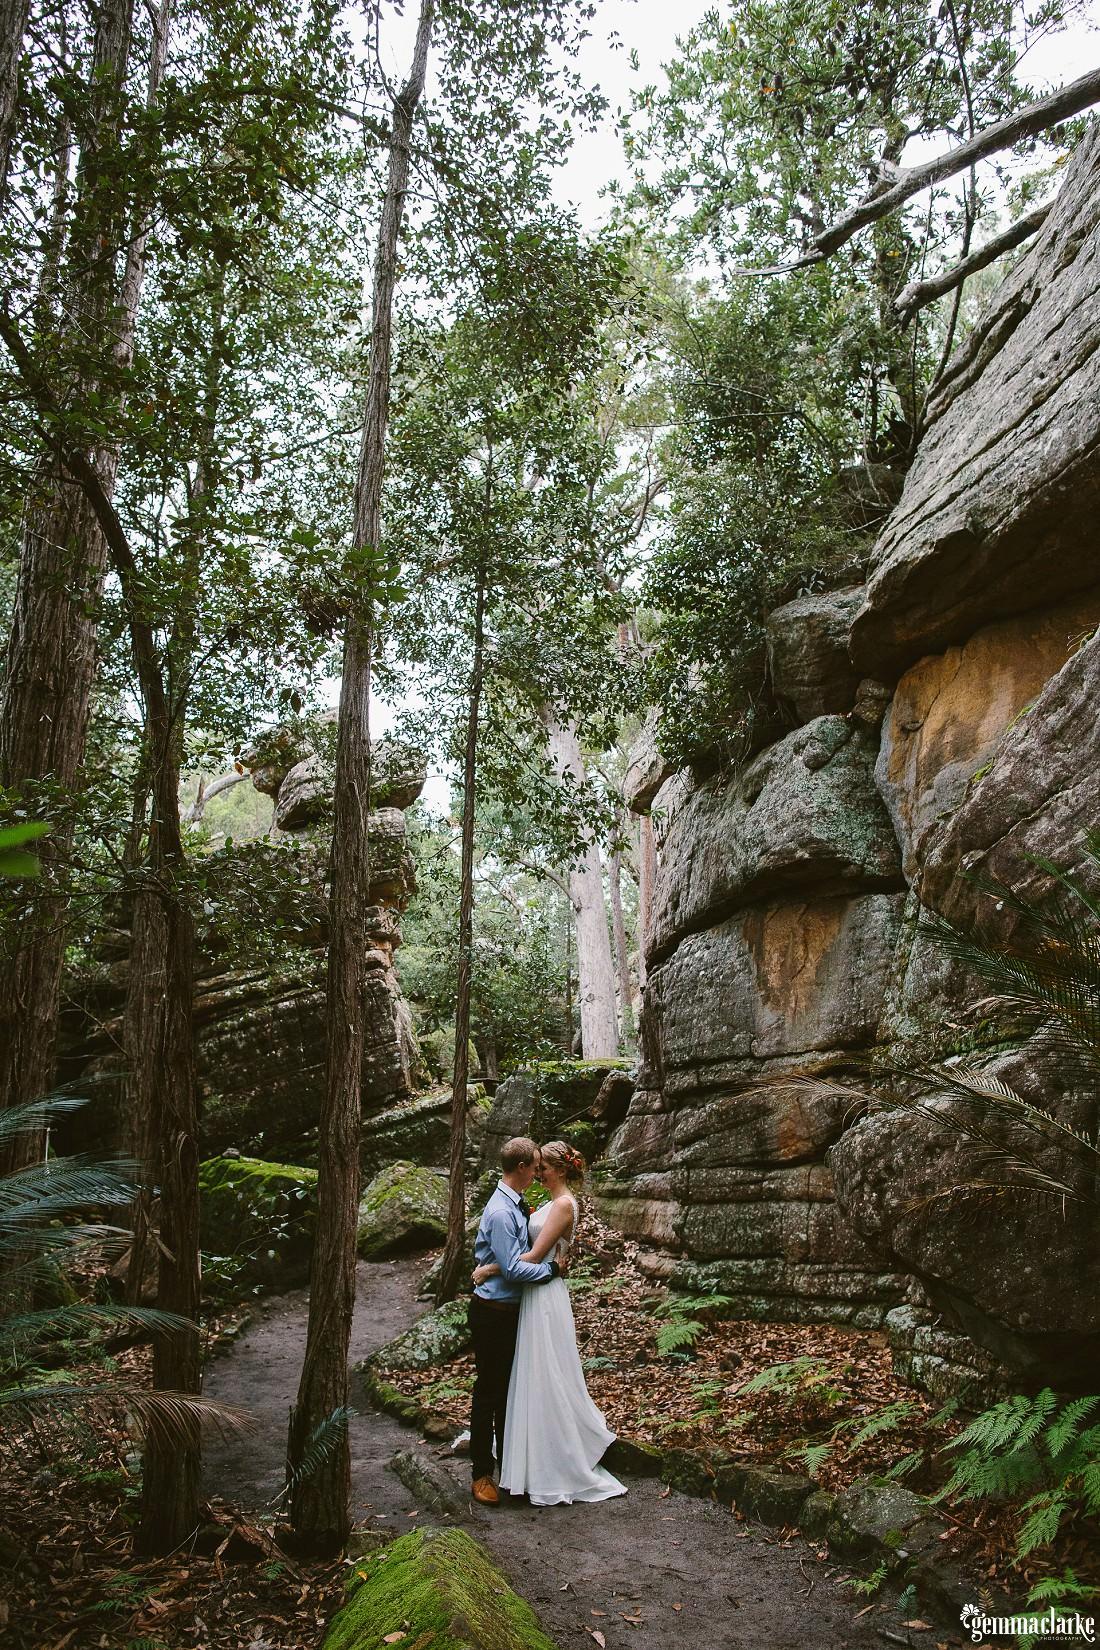 gemma-clarke-photography_kangaroo-valley-wedding_kangaroo-valley-bush-retreat_zoe-and-cam_0035